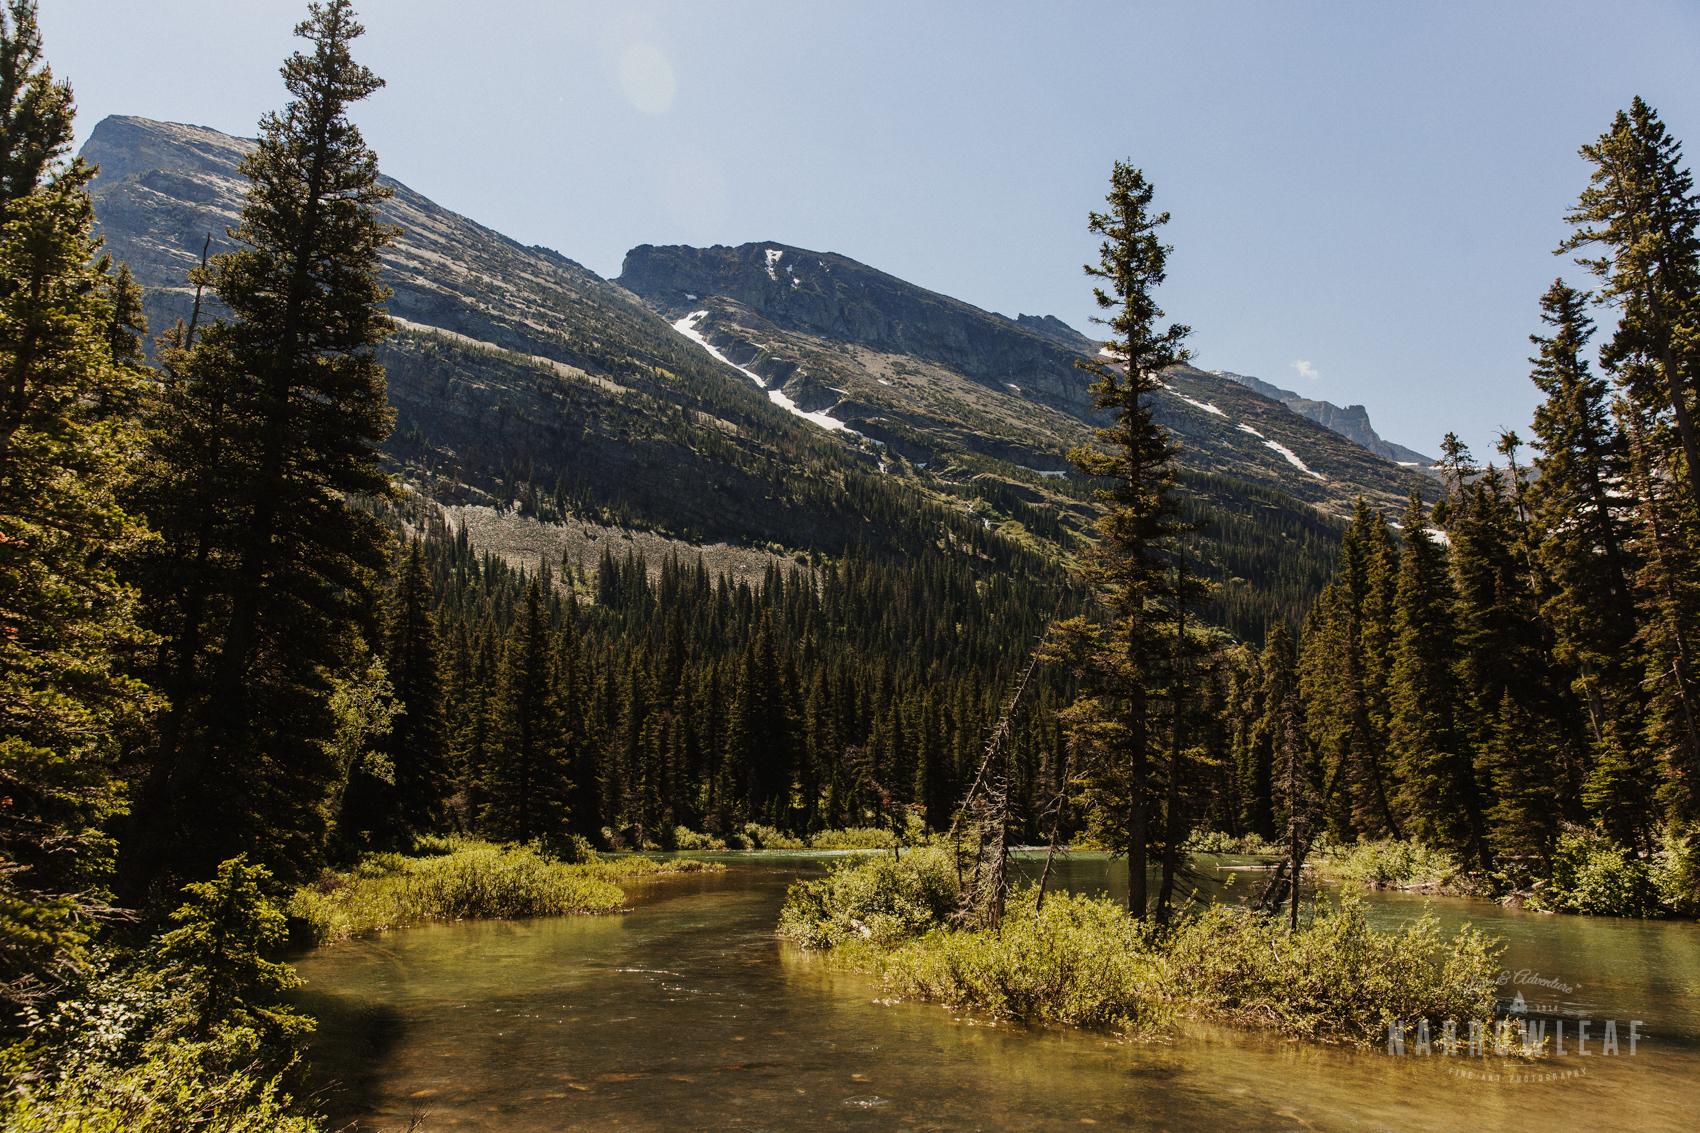 Montana-Glacier-National-Park-Many-Glacier-Narrowleaf-Love-and-Adventure-elopement-Photography-9358.jpg